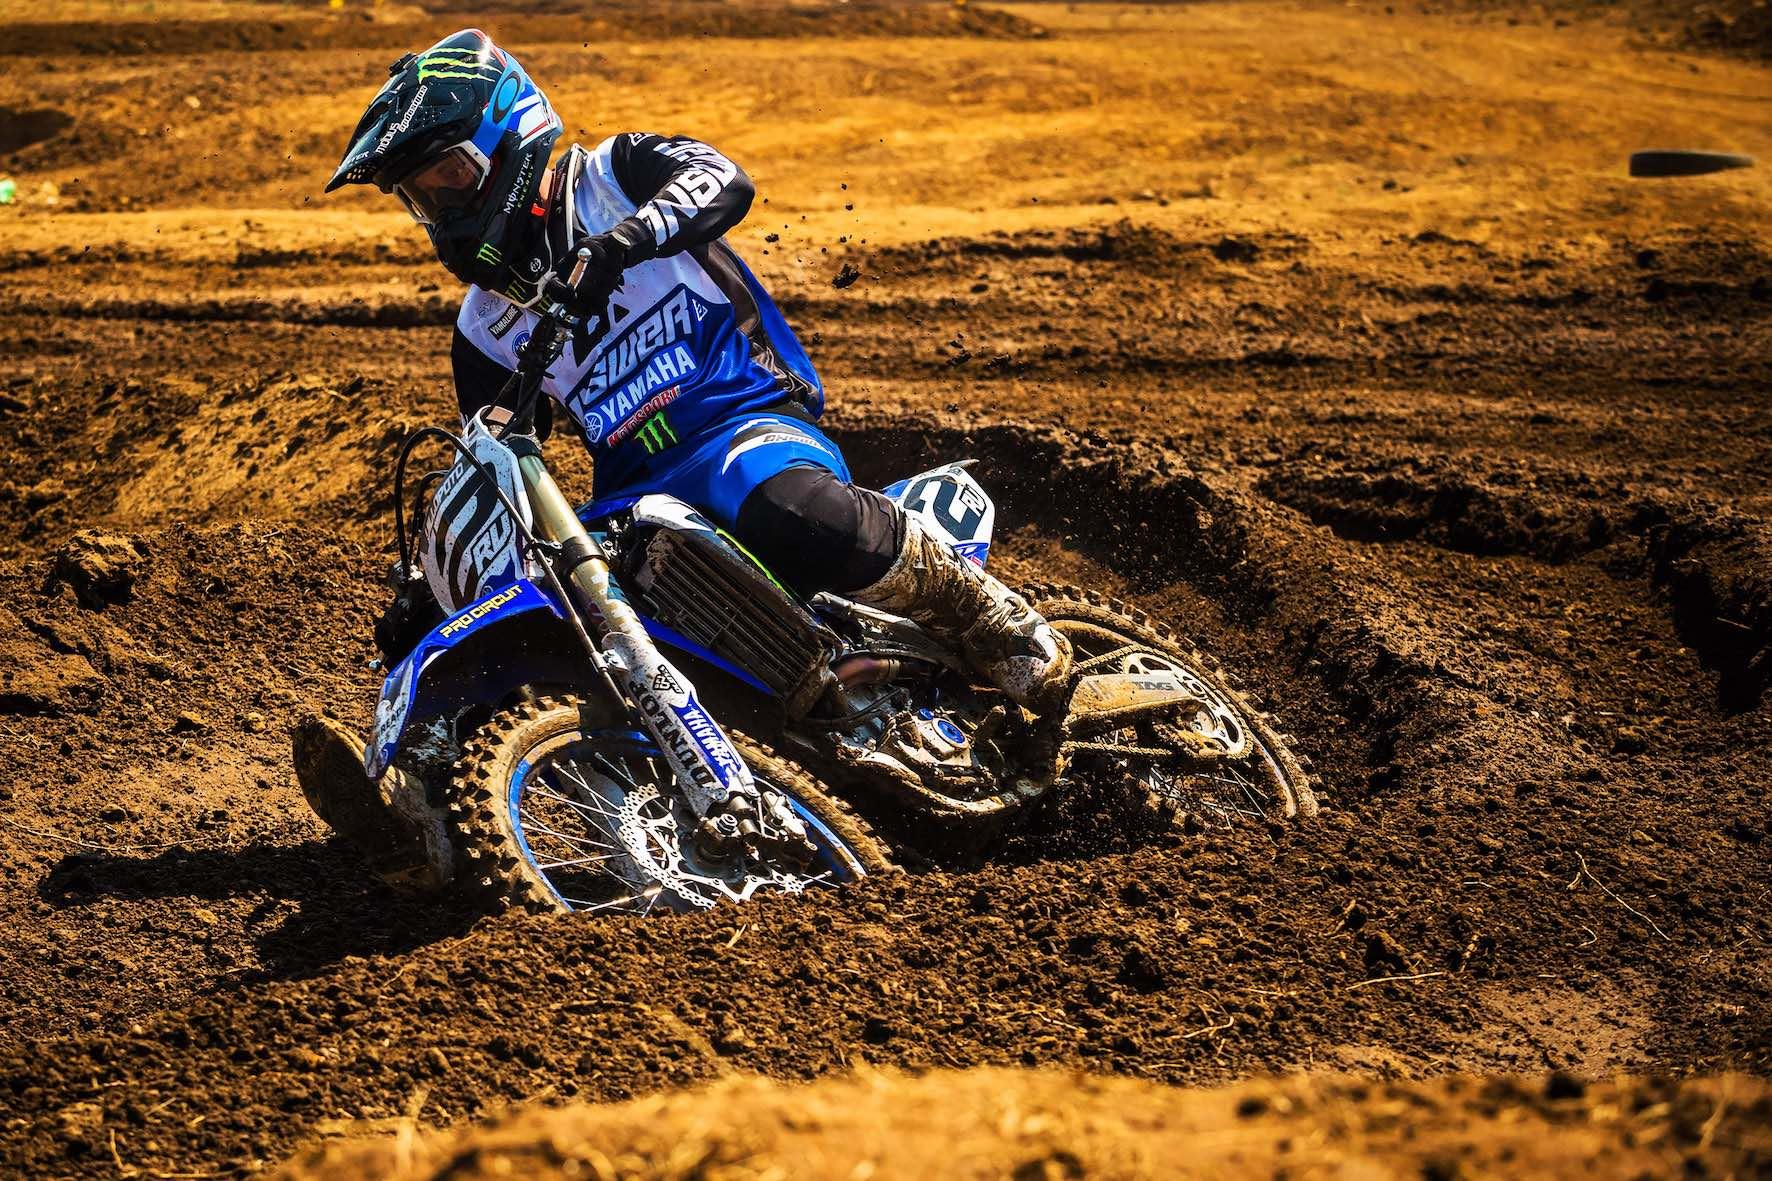 Ryan Villopoto riding the Terra Topia motocross track during the SA MX Nationals